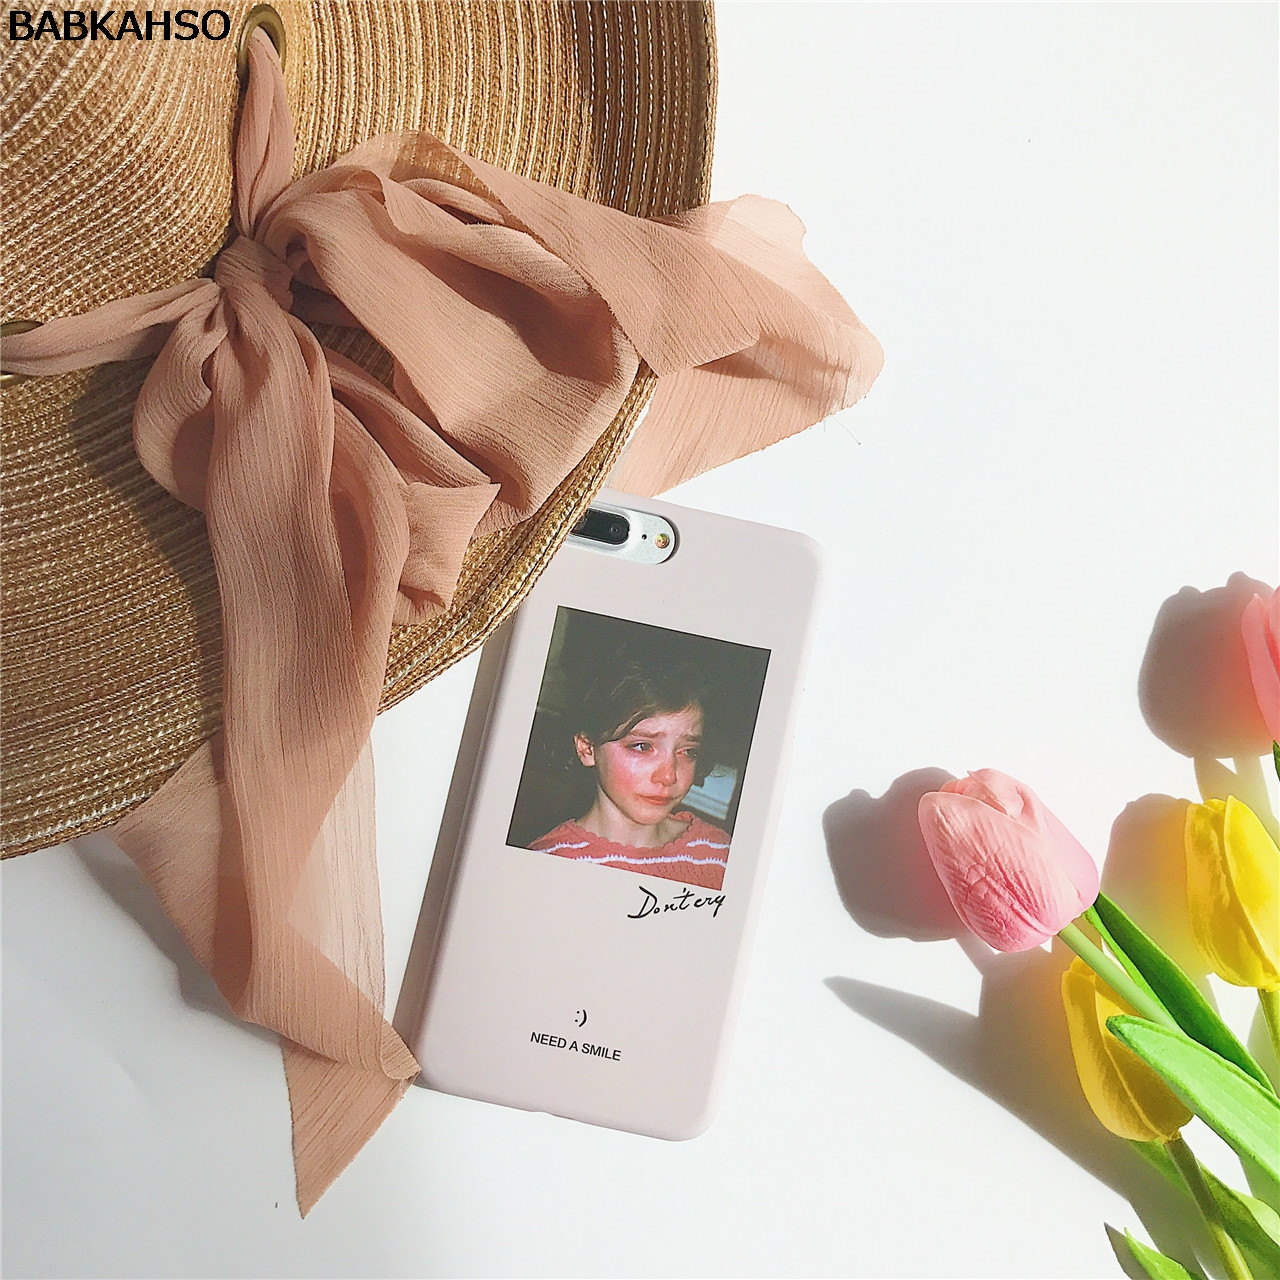 BABKAHSO Ins тренд dont cry девушка чехол для iPhone 7 Plus модная для iPhone 6 6 S плюс 6 Plus Капа Fundas Coque жесткий ...